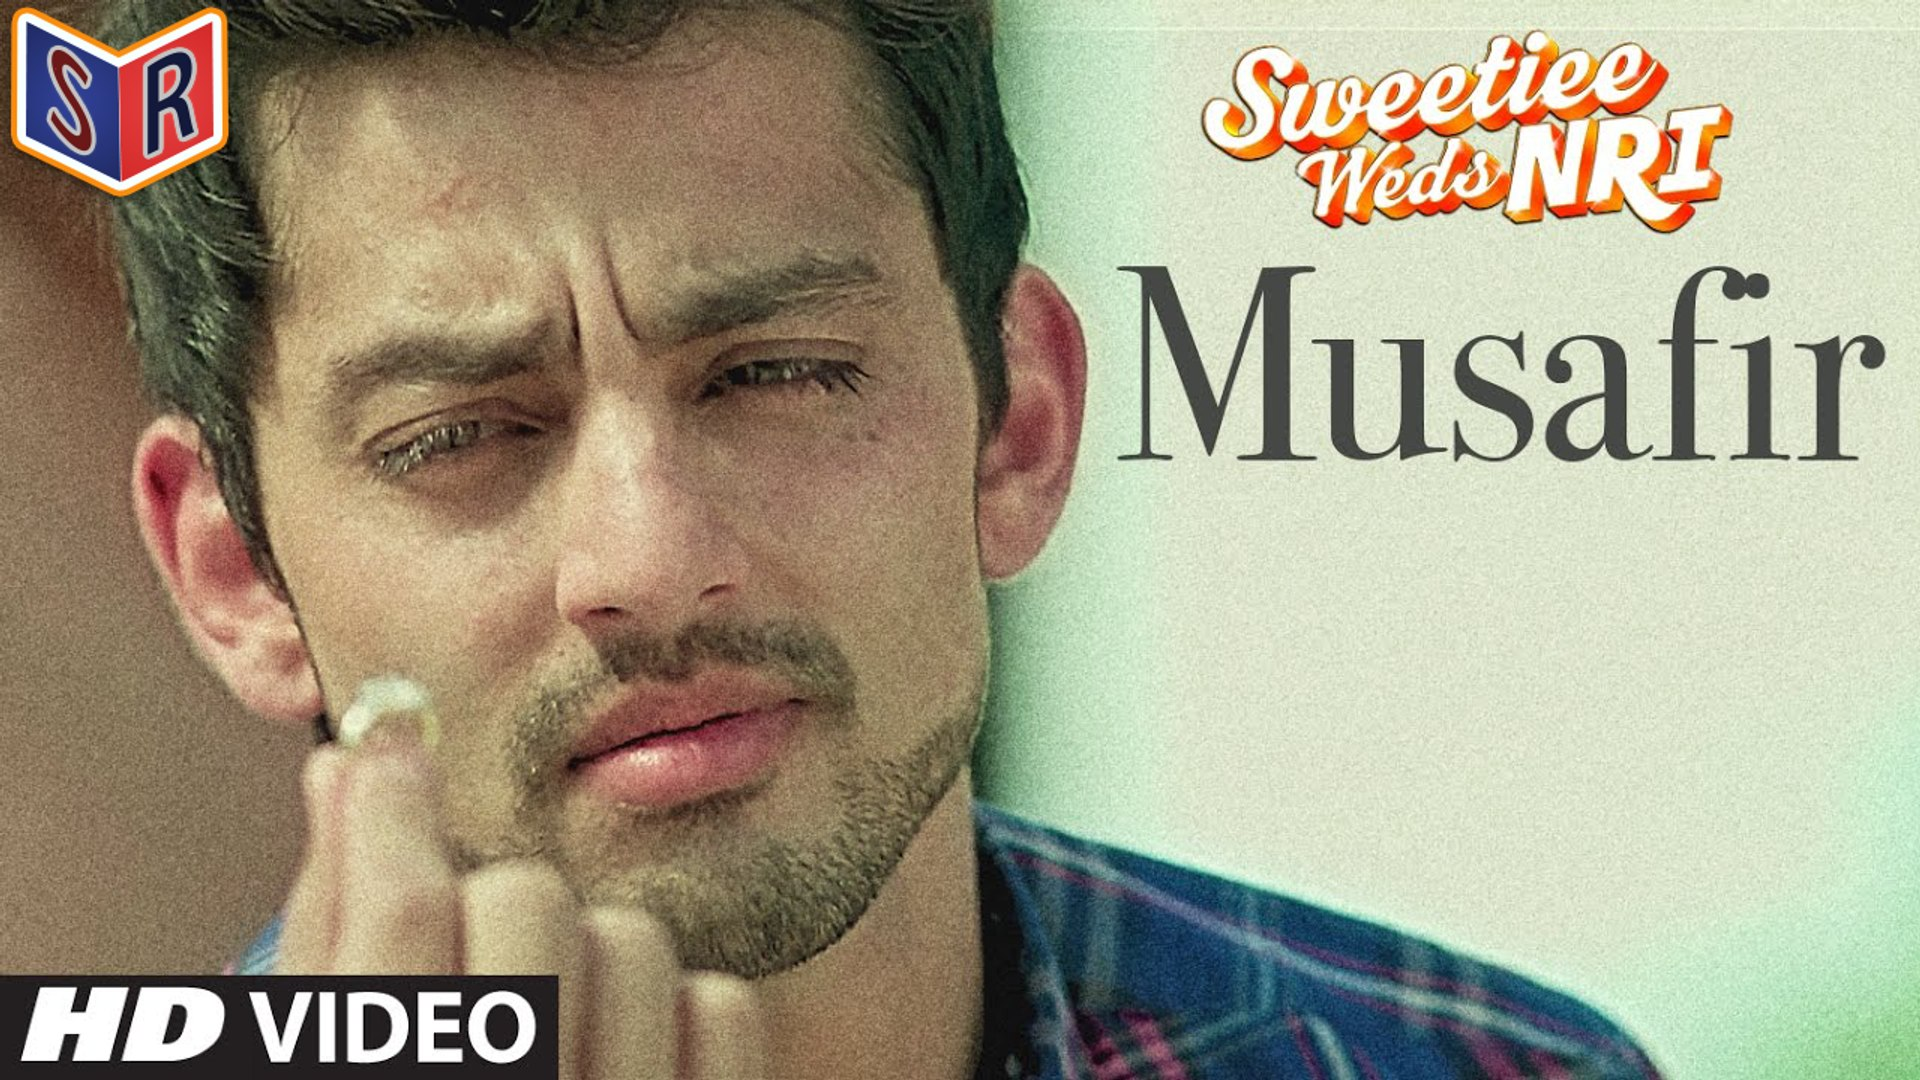 Musafir - Sweetiee Weds NRI [2017] Song By Atif Aslam & Palak Muchhal FT. Himansh Kohli & Zo